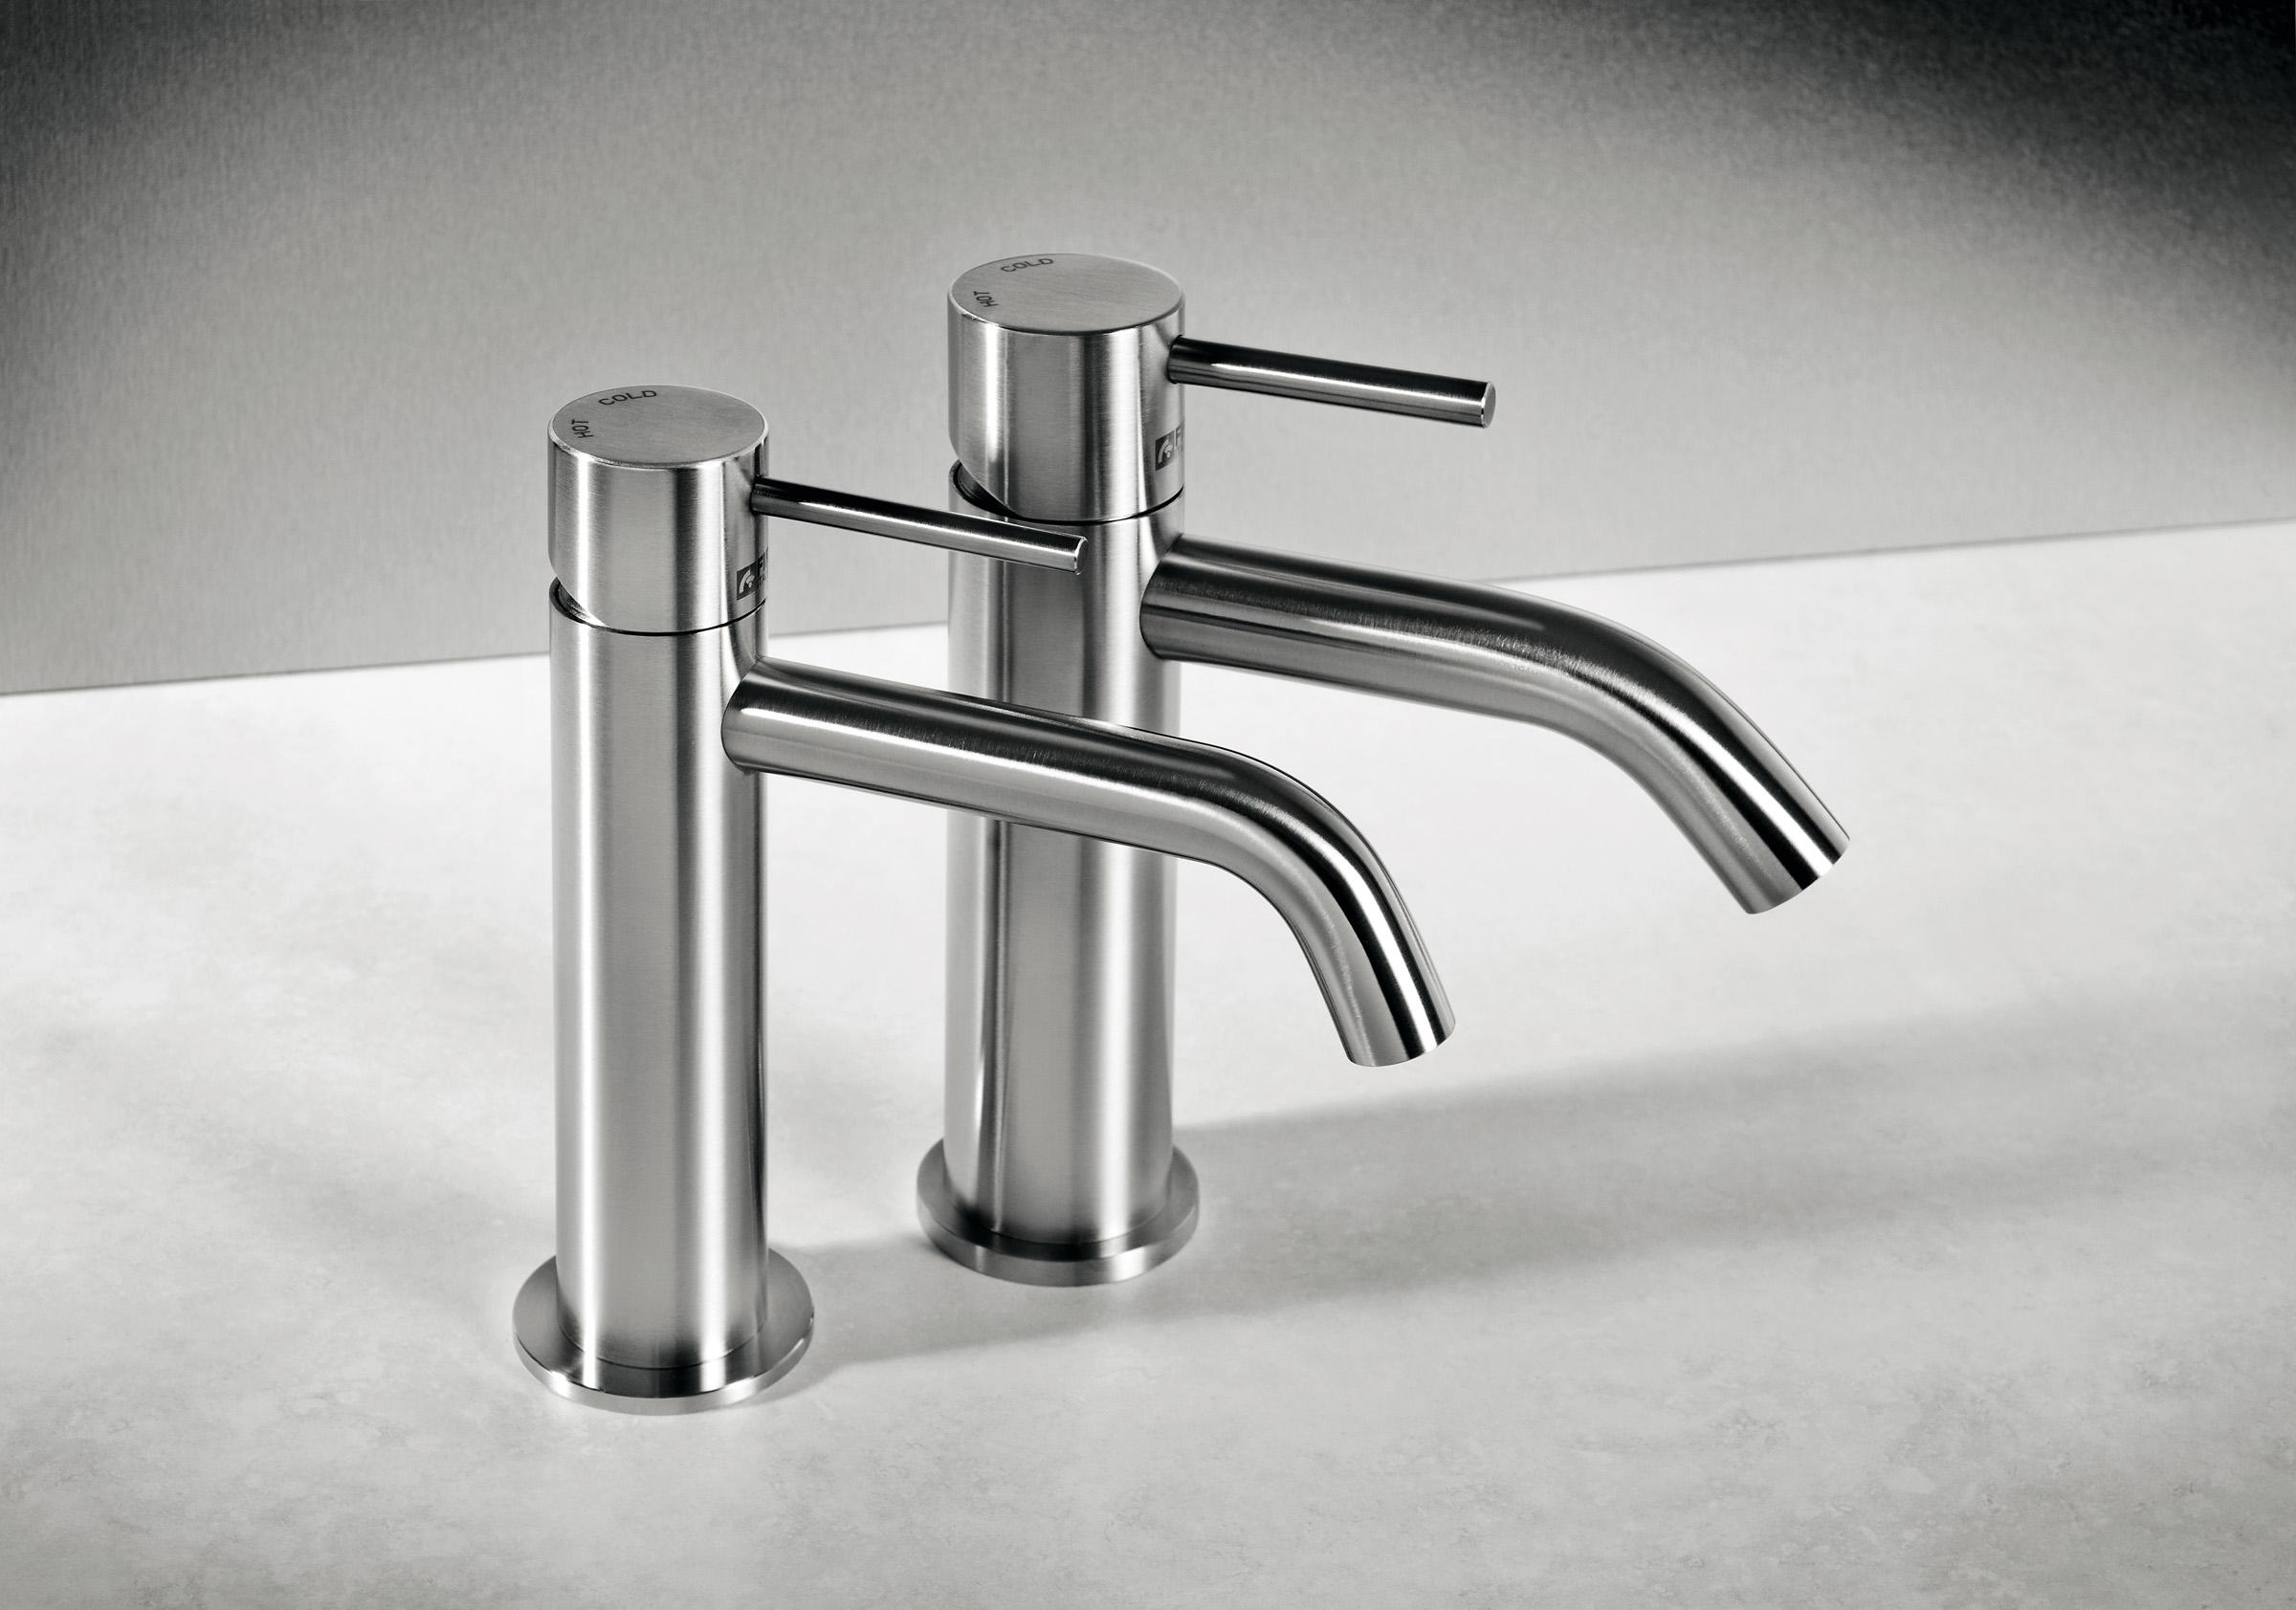 Lavabo acciaio lavello lavandino lavabo cm acciaio inox for Lavandino acciaio